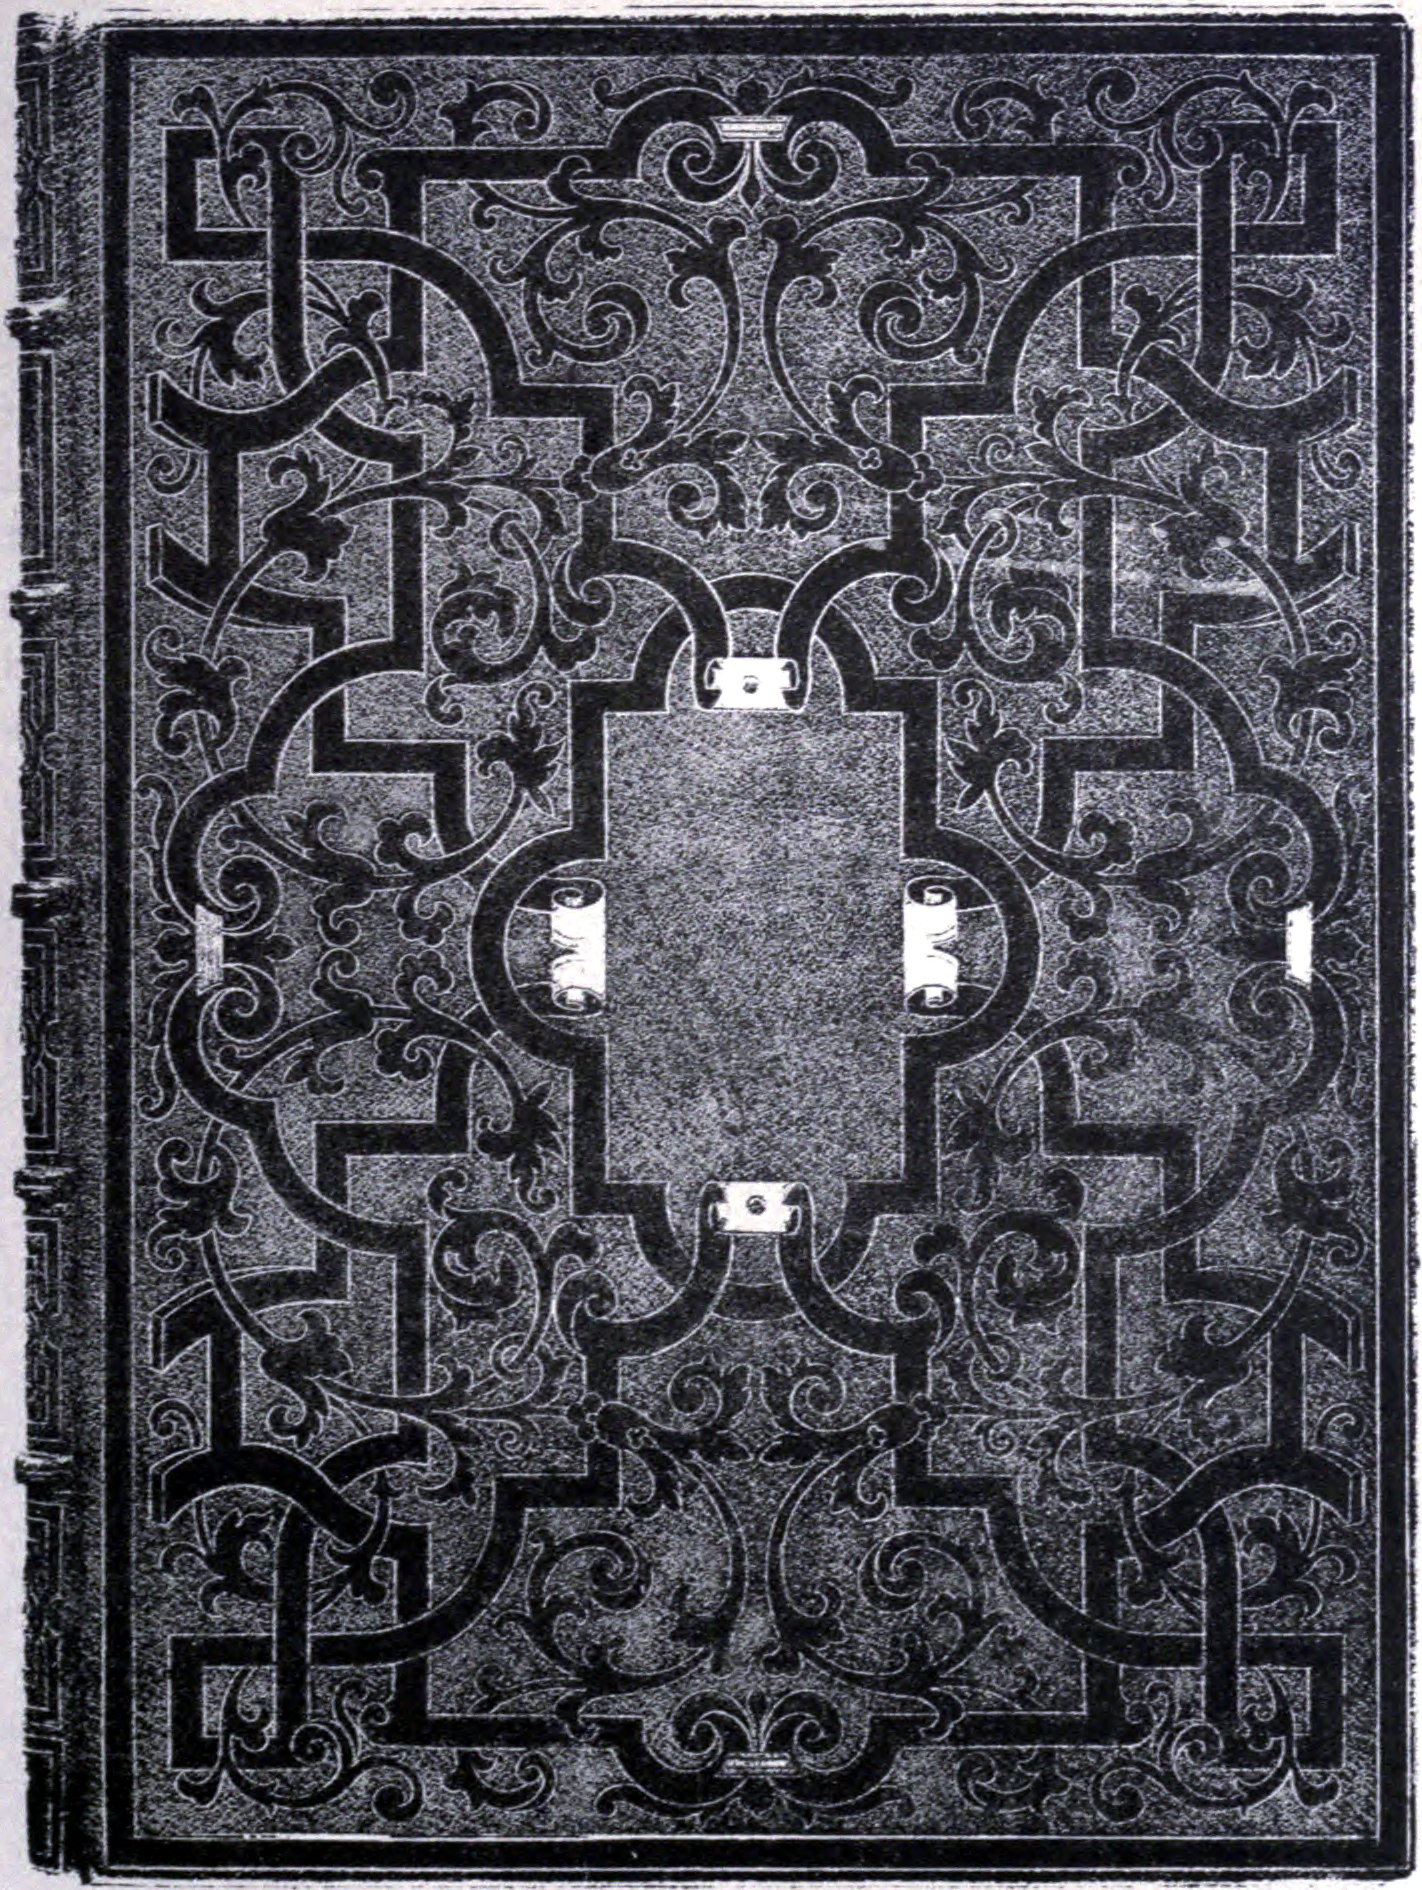 Old Book Cover Plain : File art of bookbinding p maioli wikimedia commons